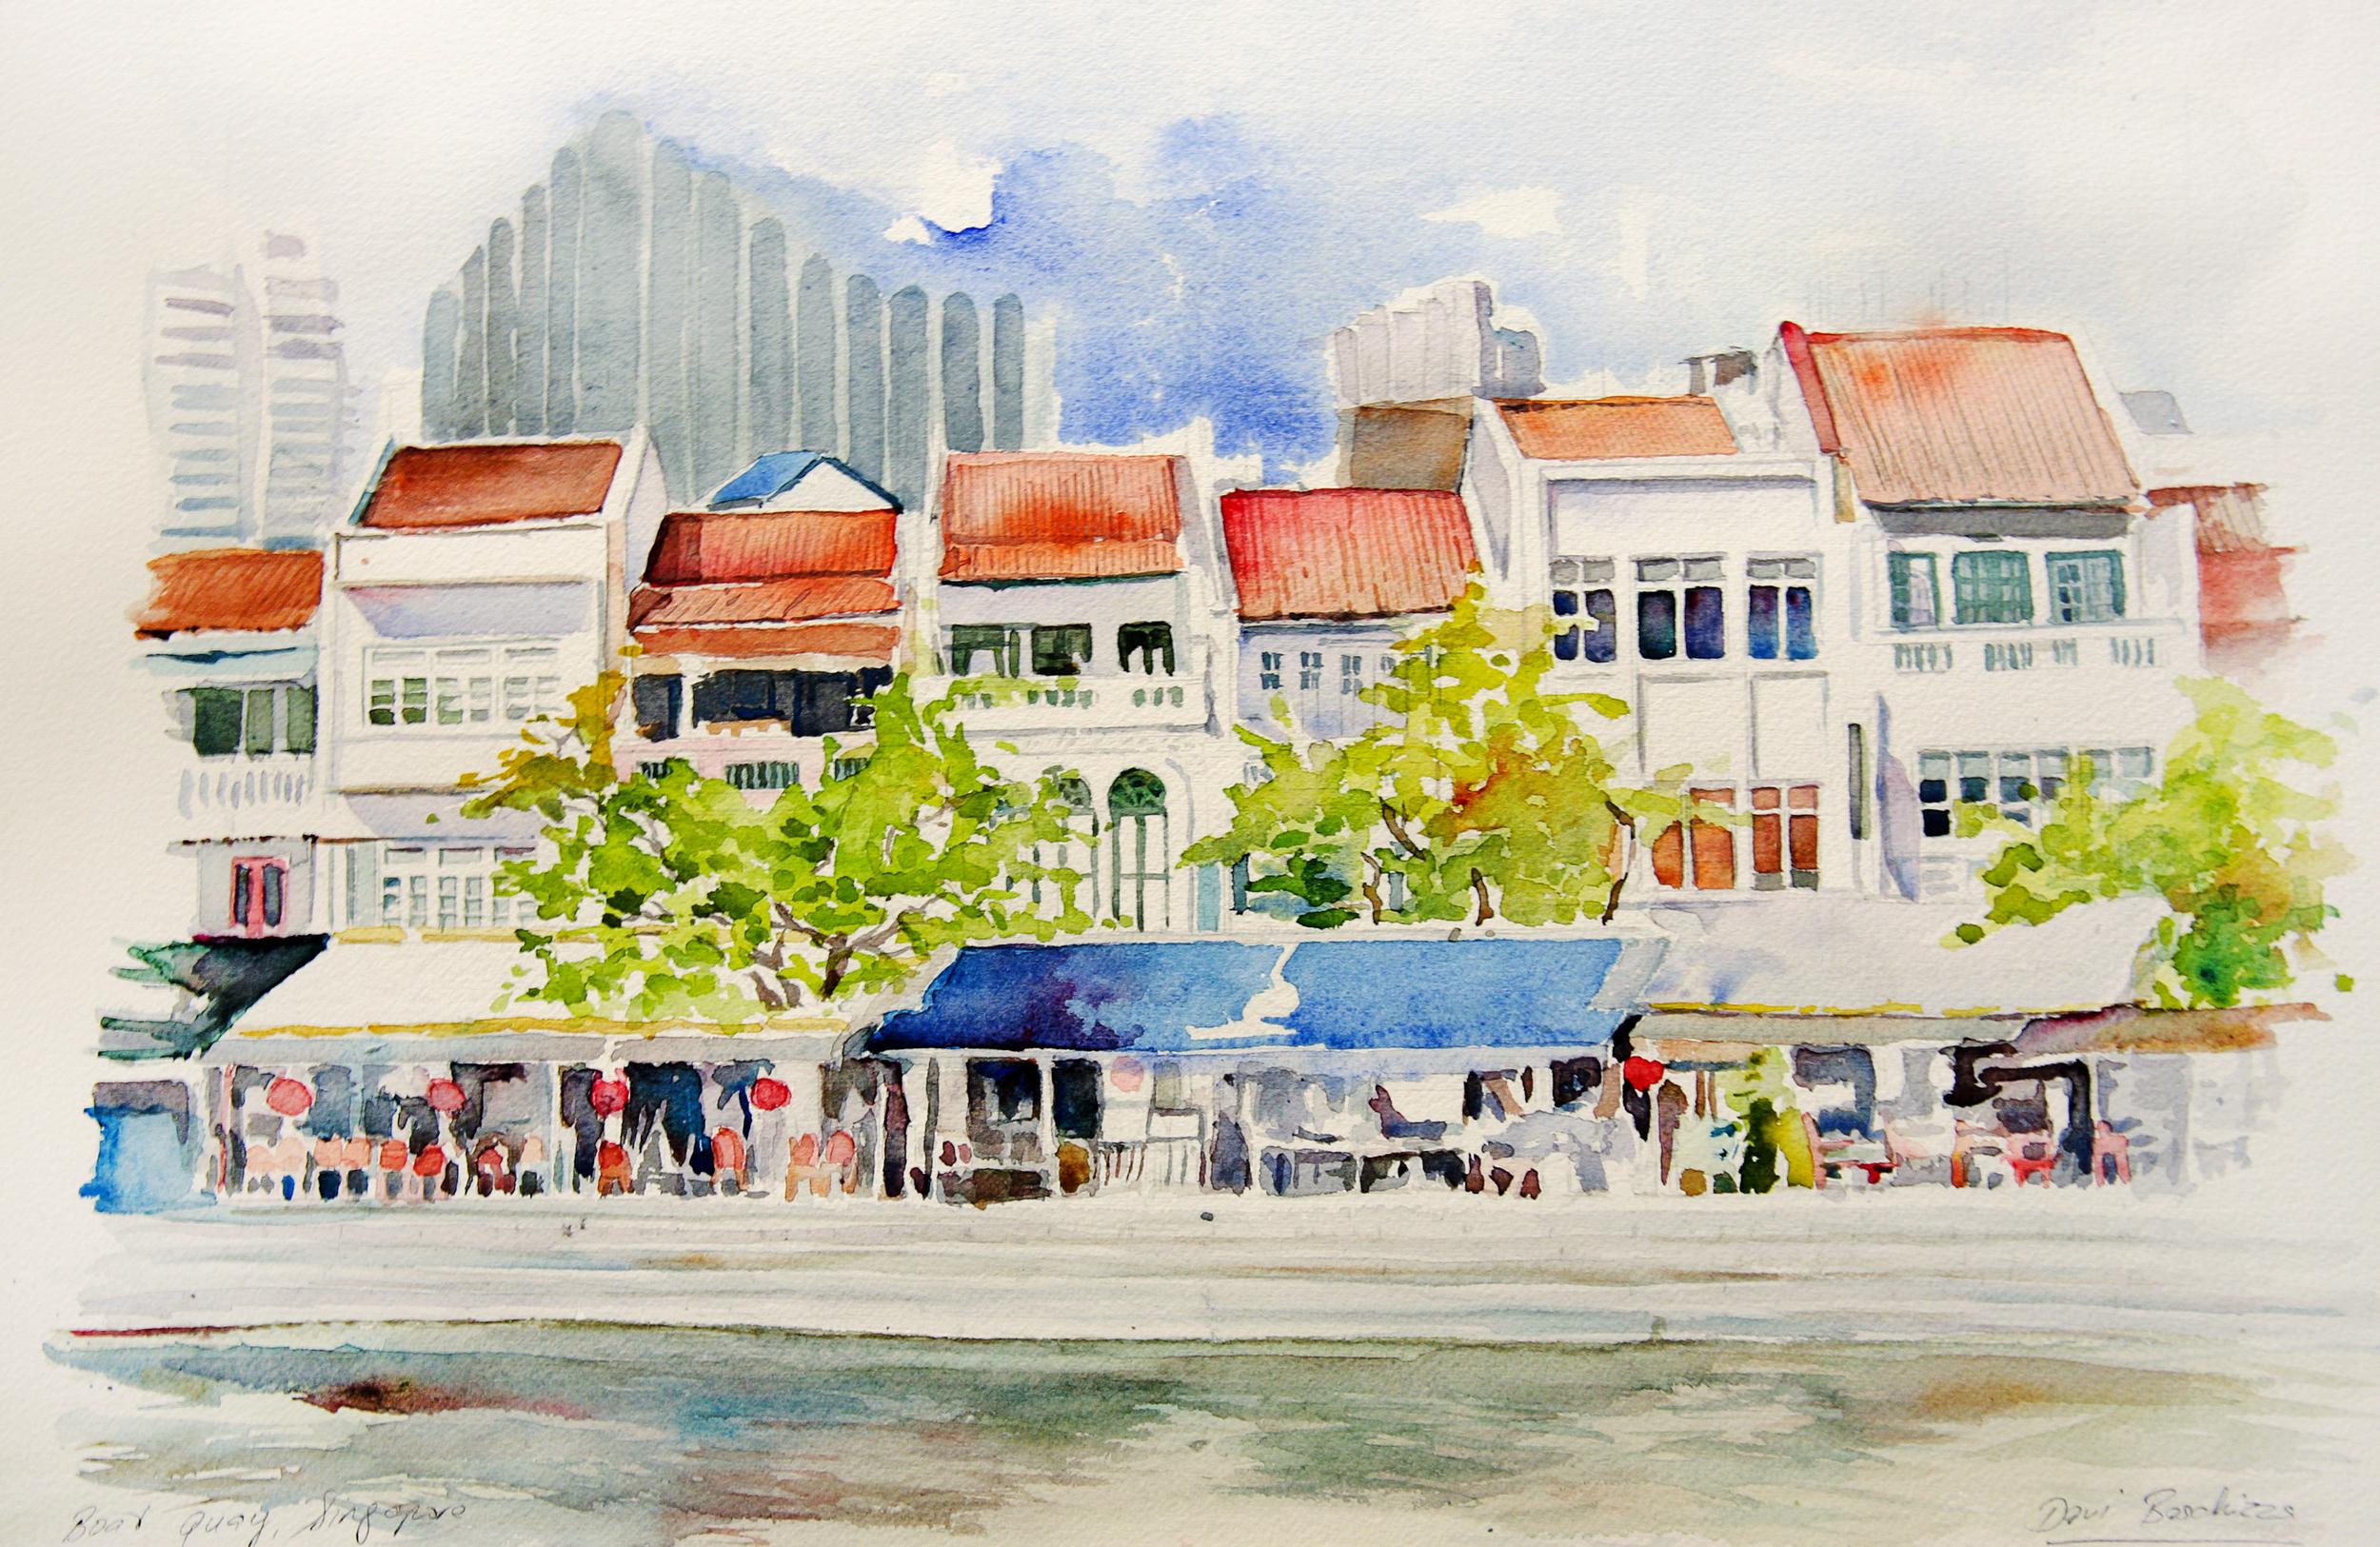 Boat Quay no. 1